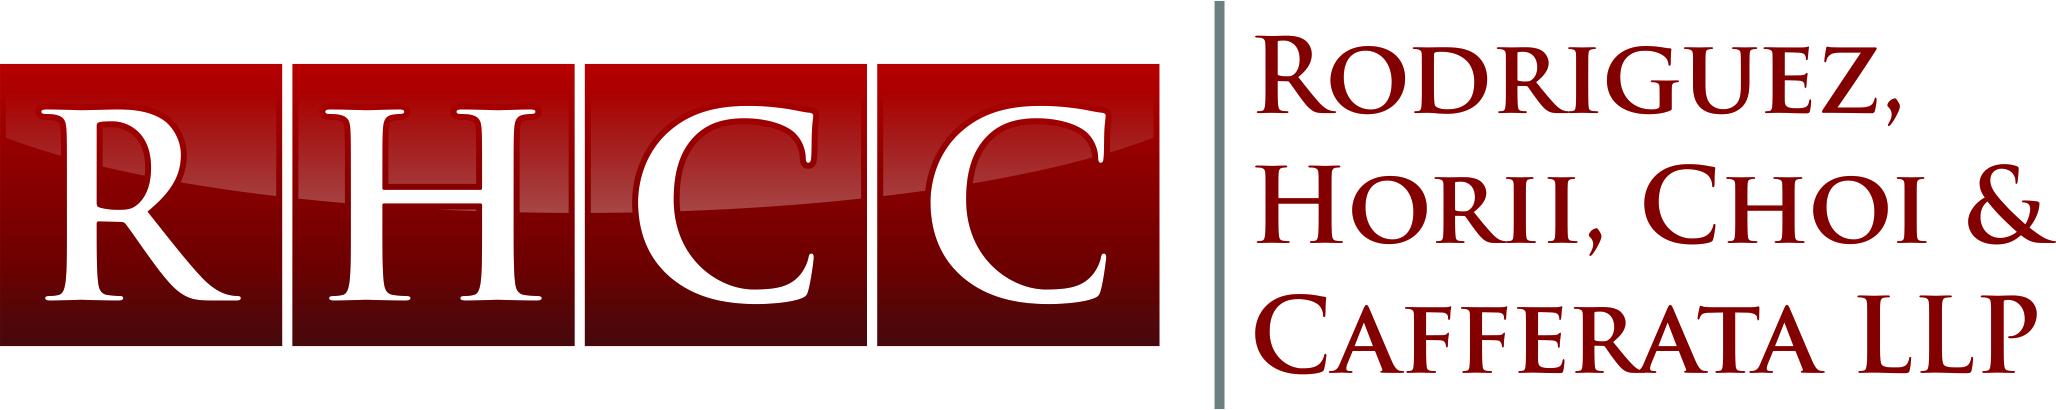 rhcc_(1).jpg